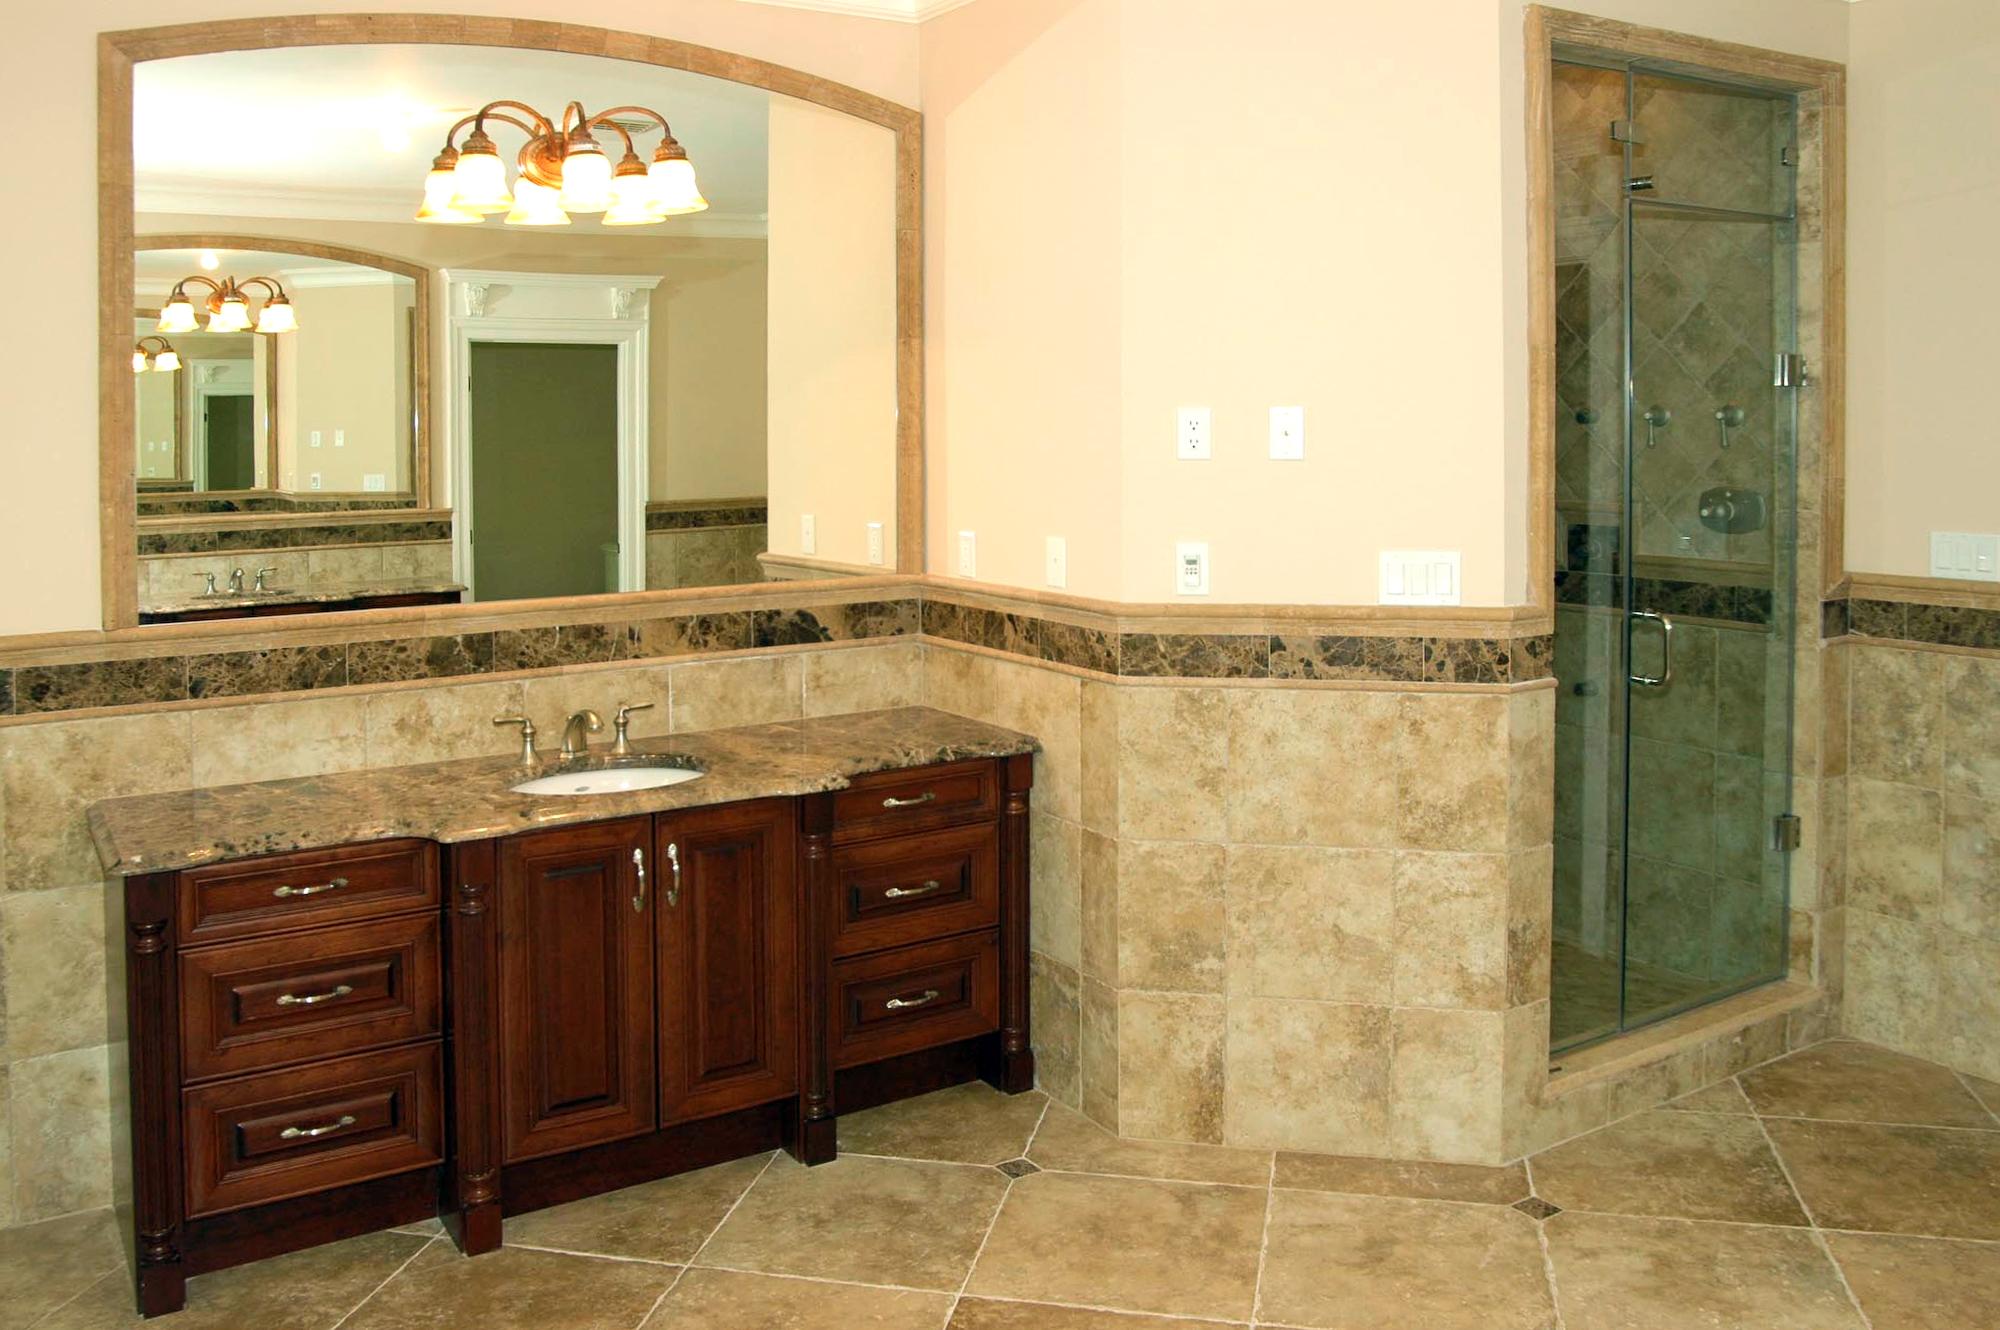 14 - Custom beveled vanity mirror